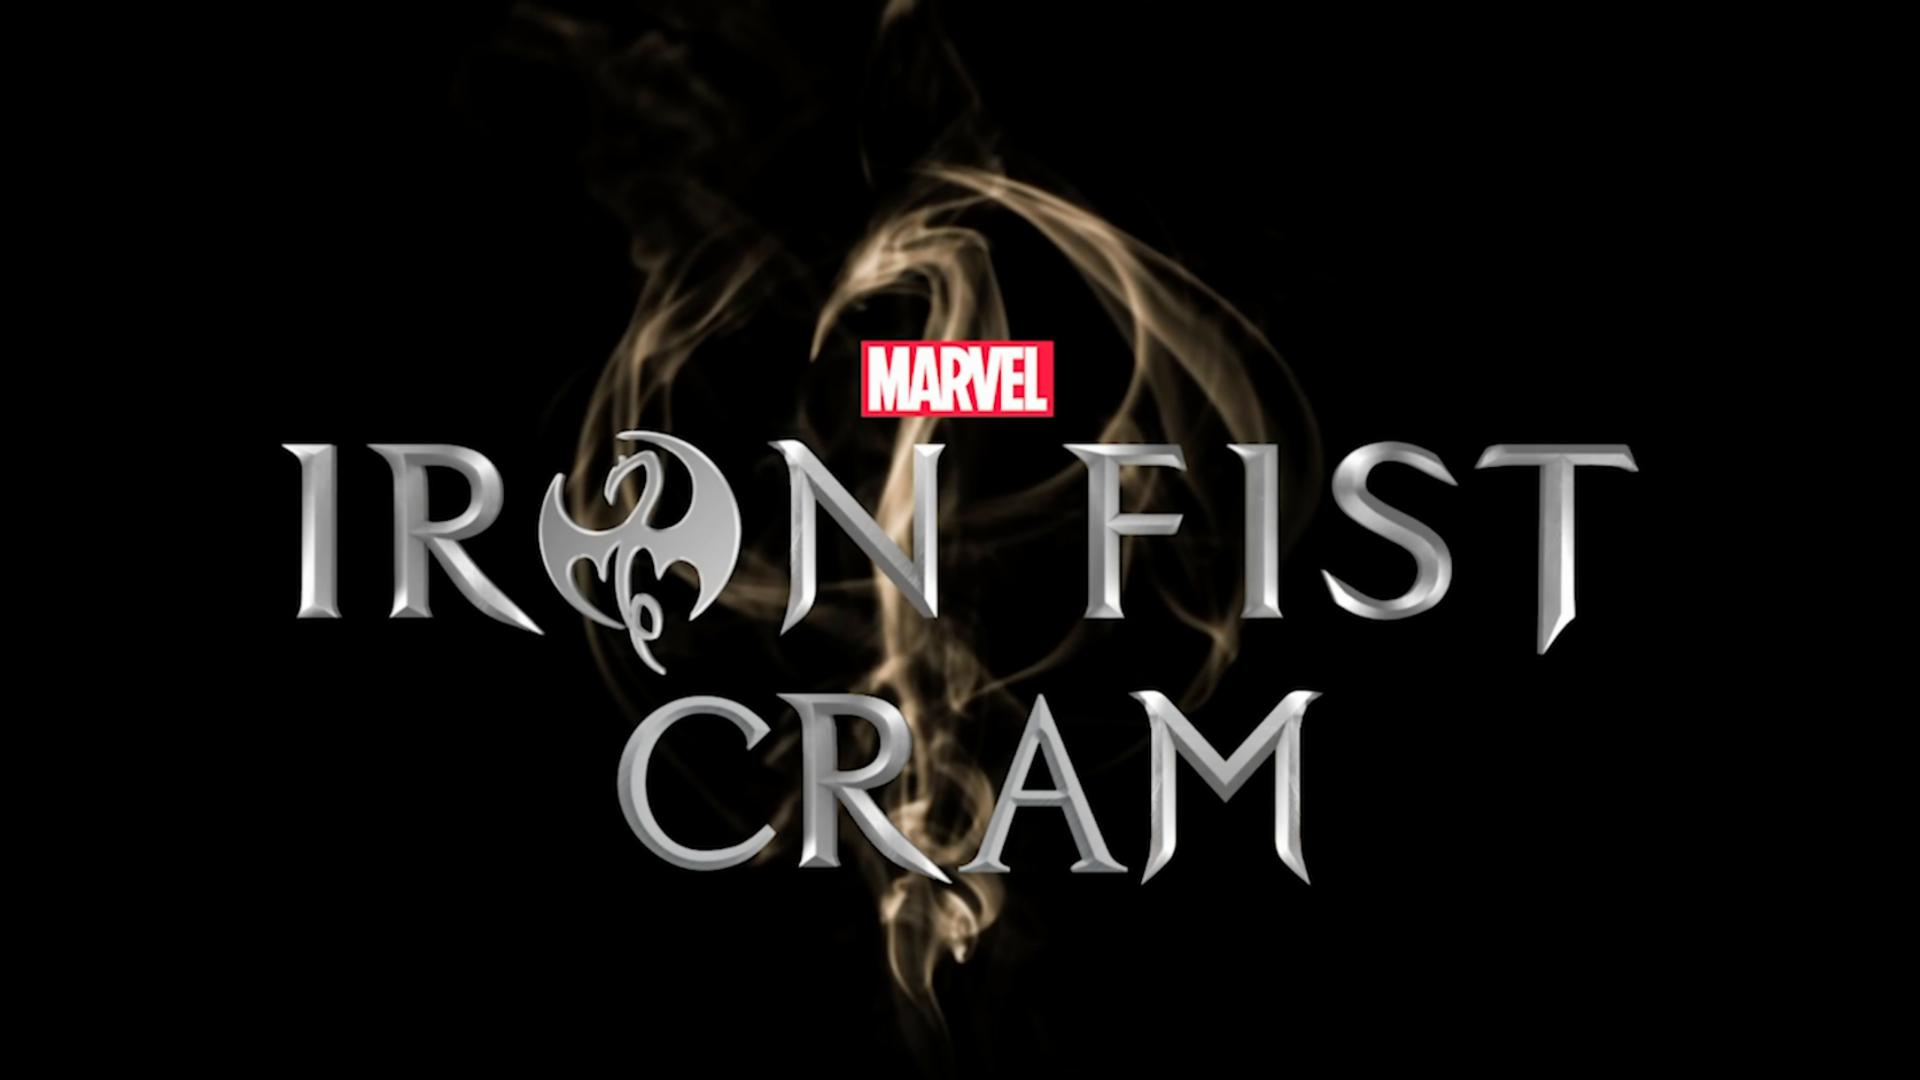 Iron Fist CRAM! screen capture